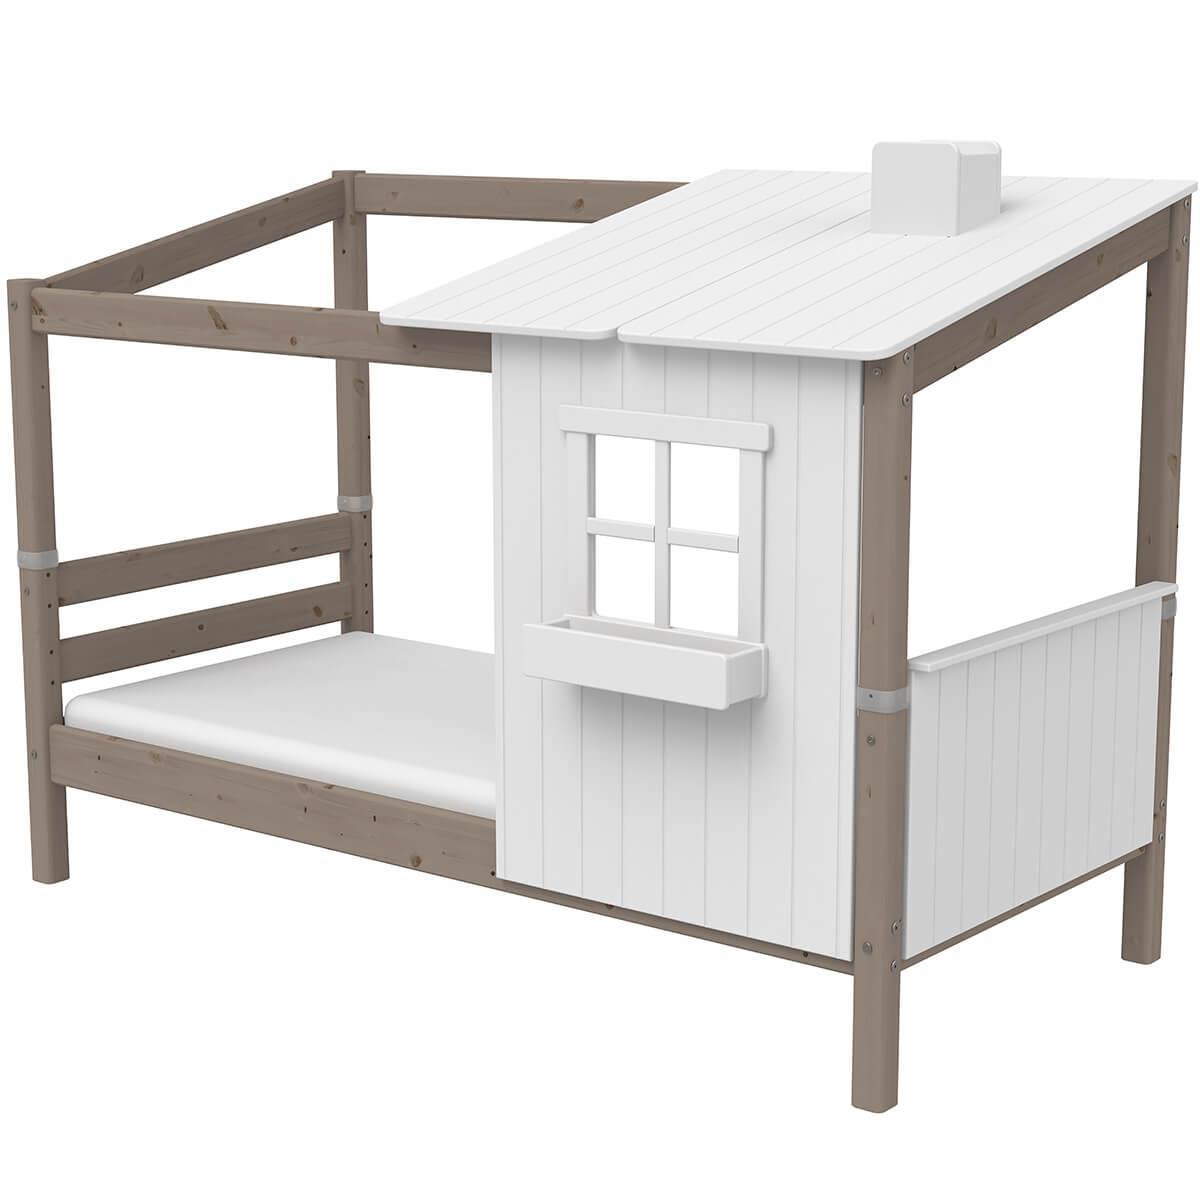 Lit bas évolutif cabane 90x190cm 1/2 PLAY HOUSE CLASSIC Flexa terra-blanc